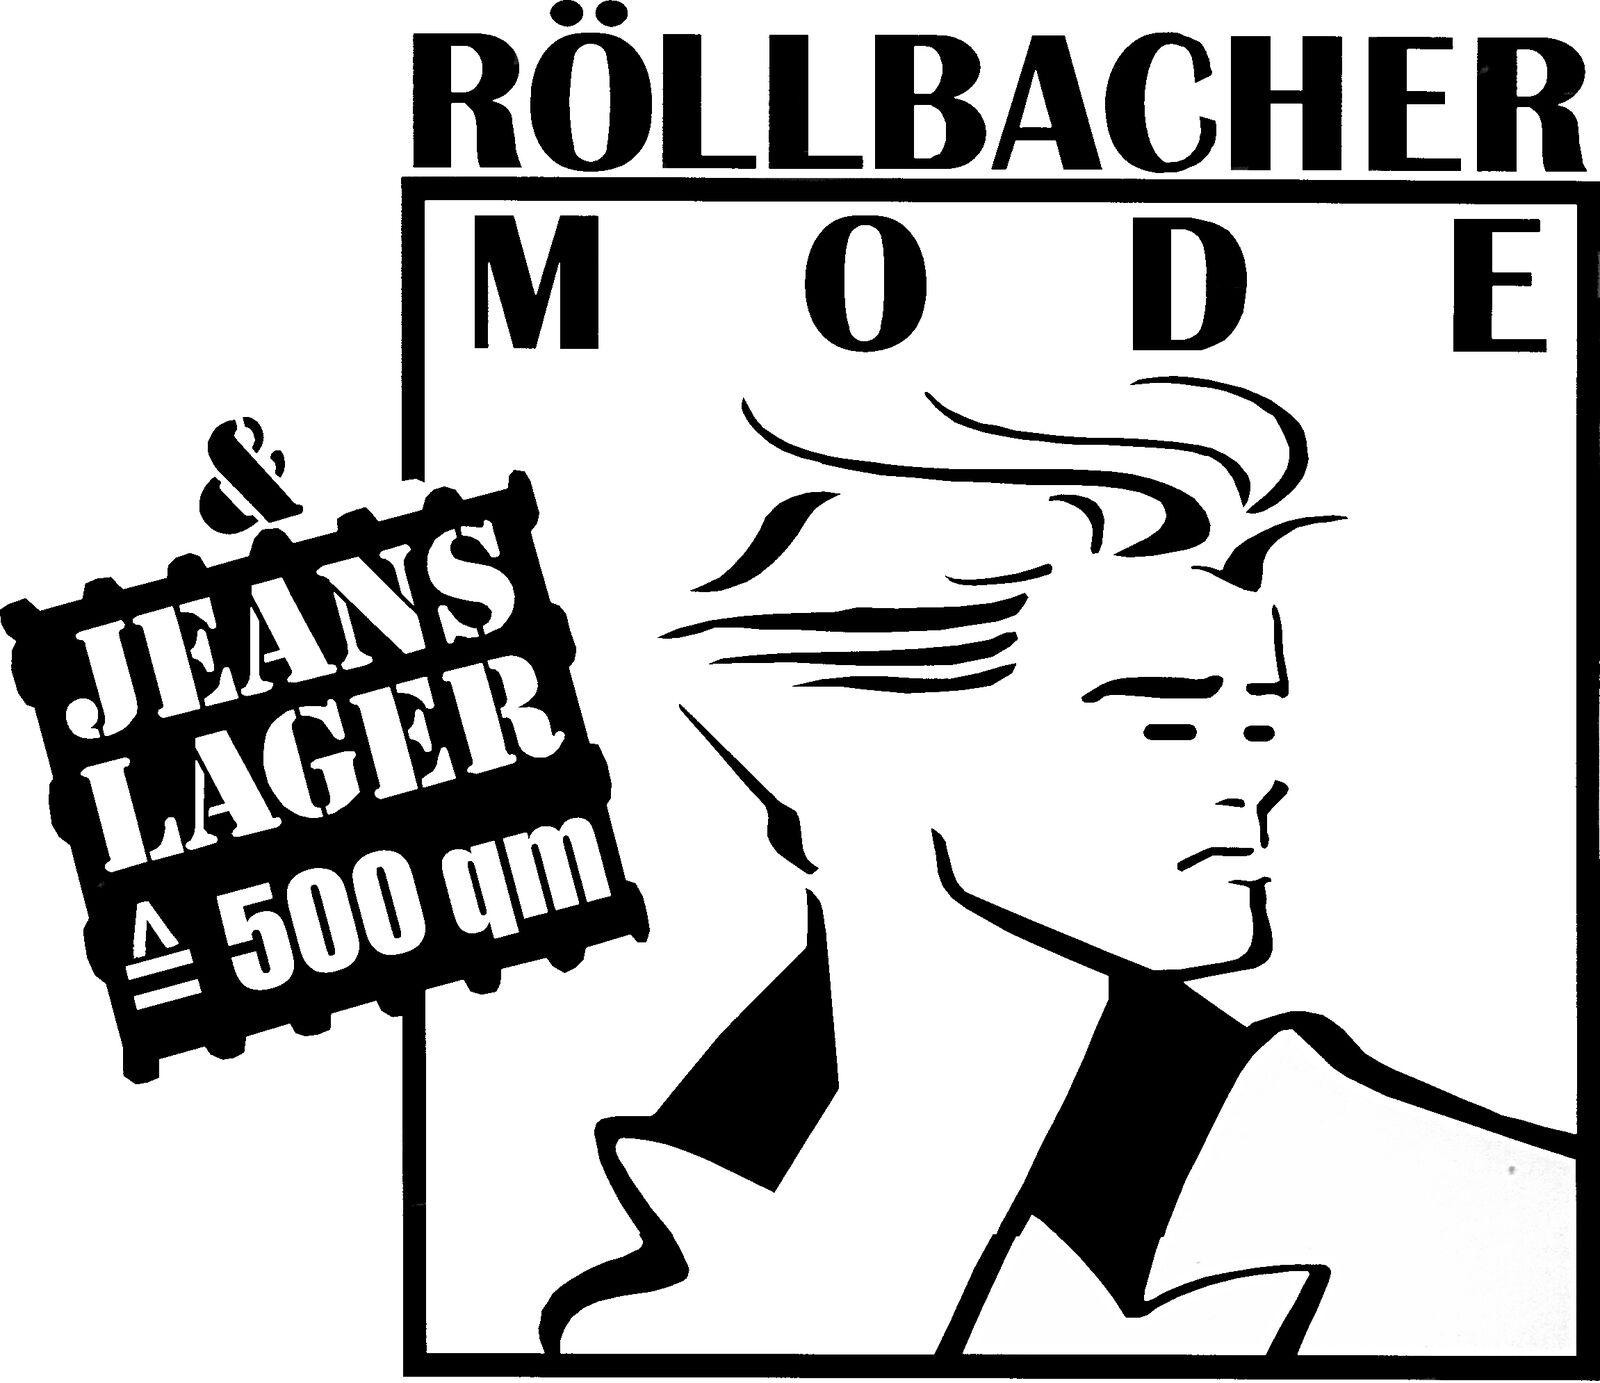 roellbacher-mode-jeans